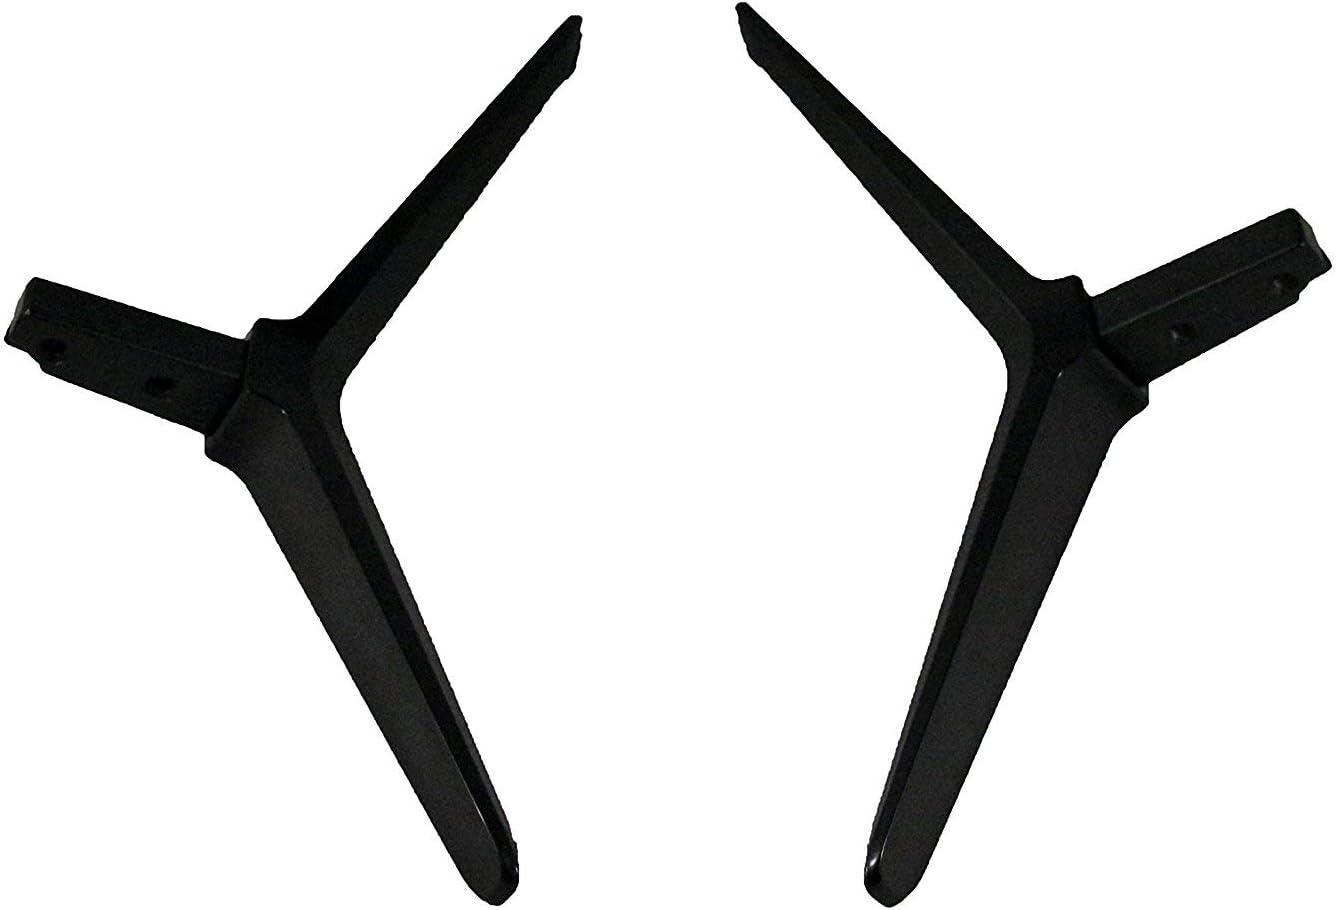 VIZIO TV Base Stand Legs for Models E48-C2 E55-C2 Screws Included